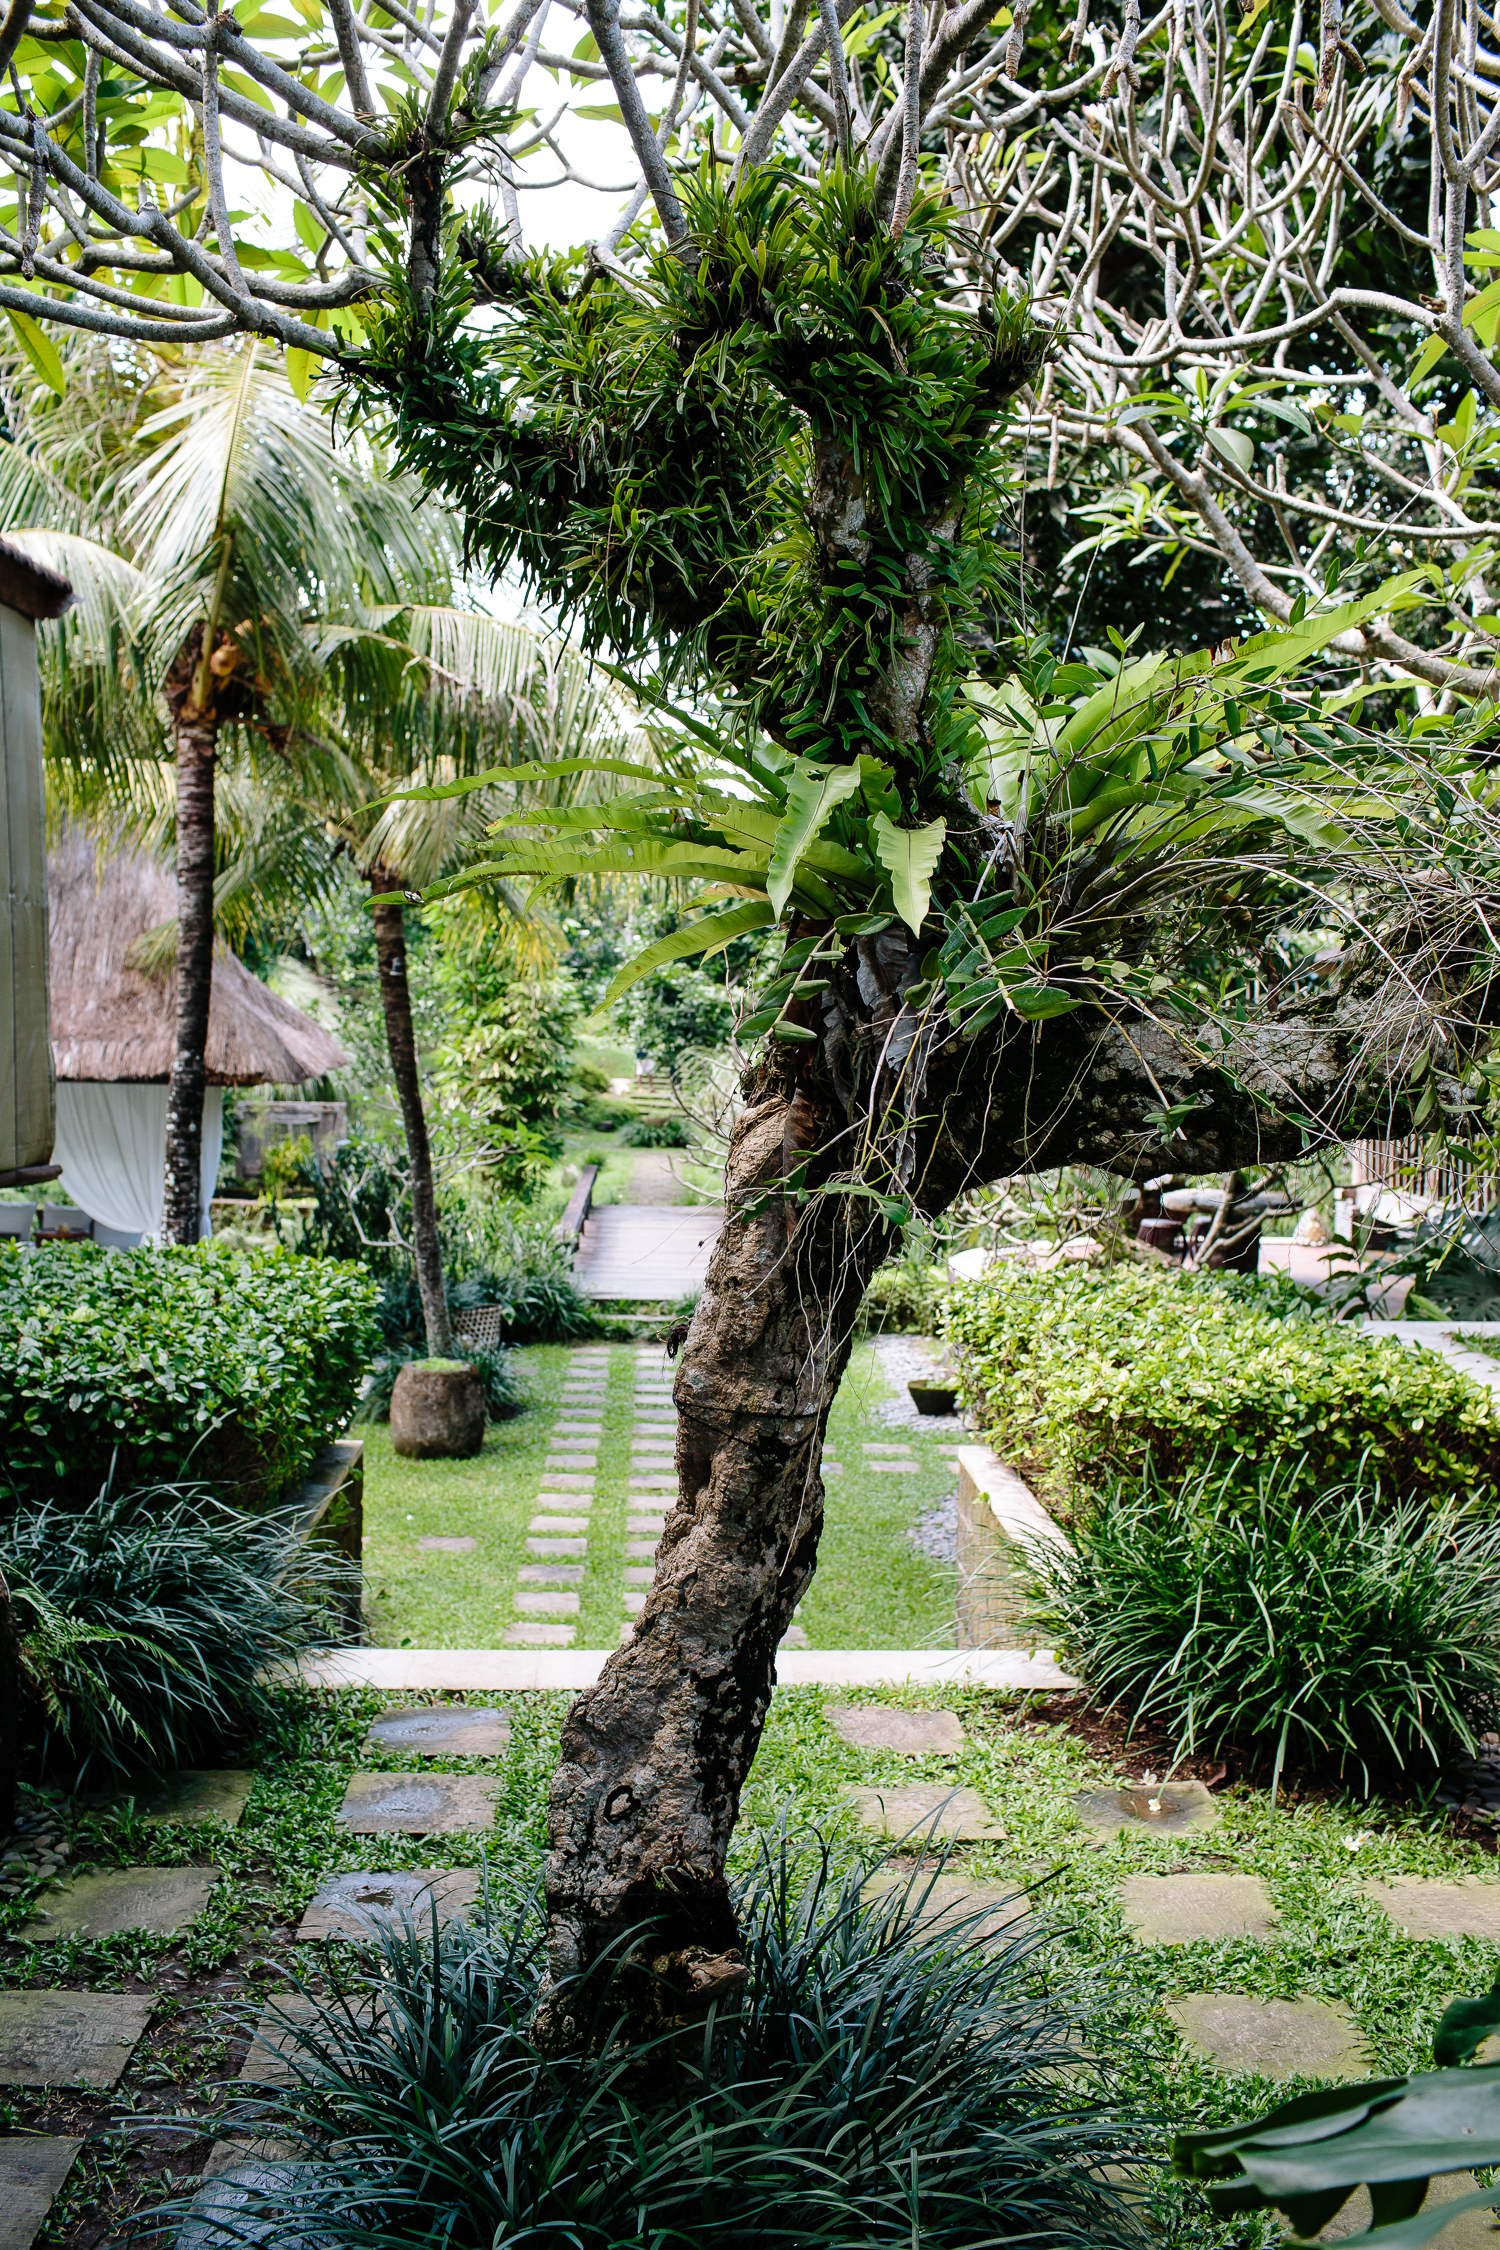 Bali-Kalapa-2016-5010.jpg